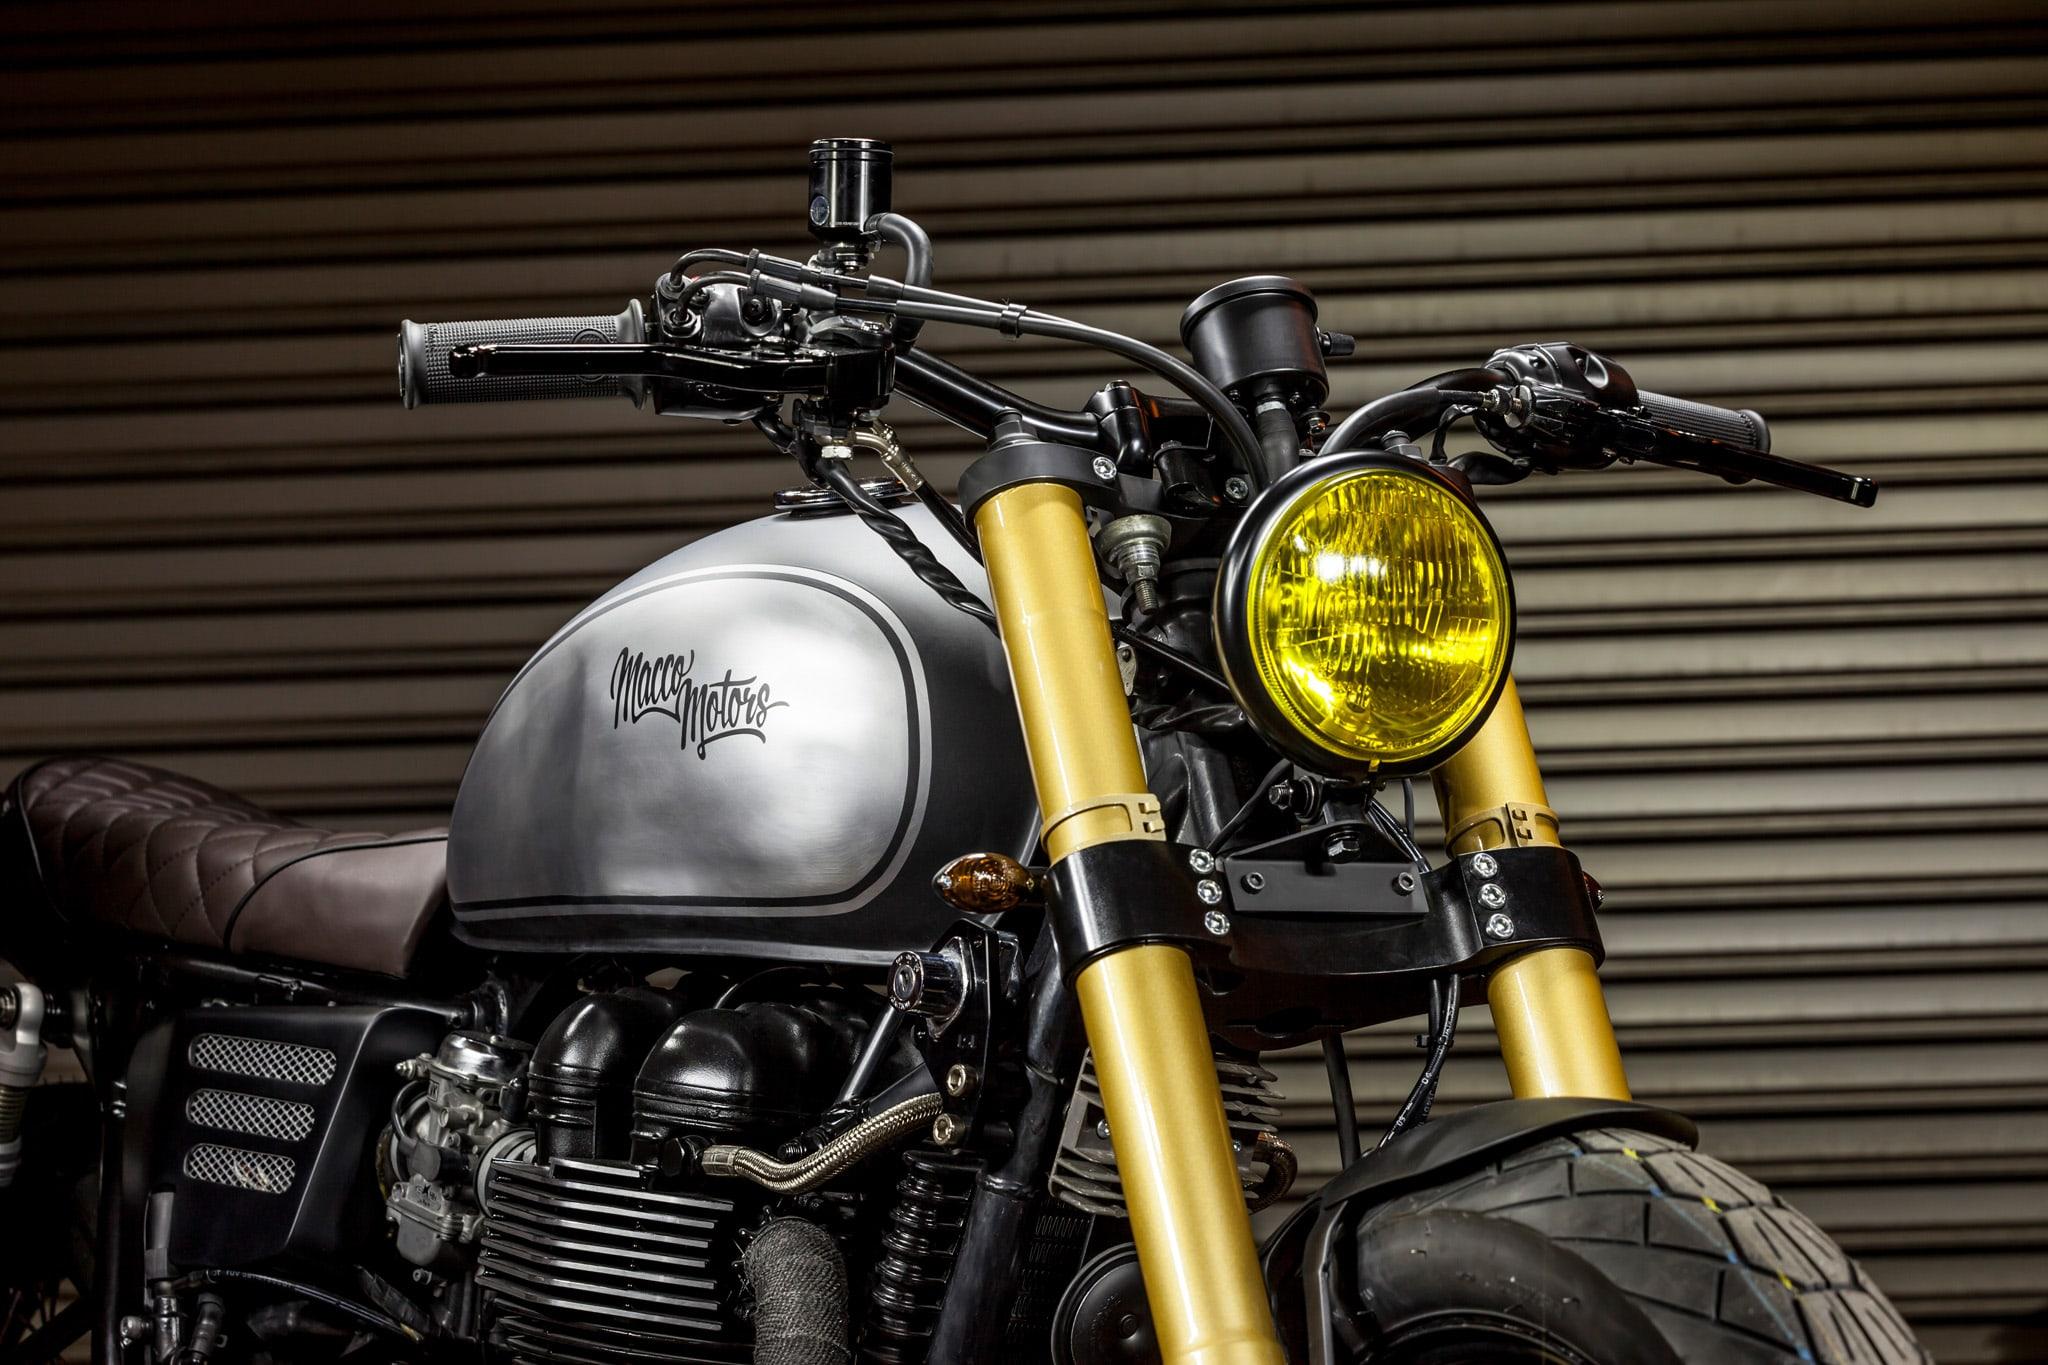 Triumph-Bonneville-The-Maltese-Falcon-Moto-Macco-Motors-Effronté-04-min